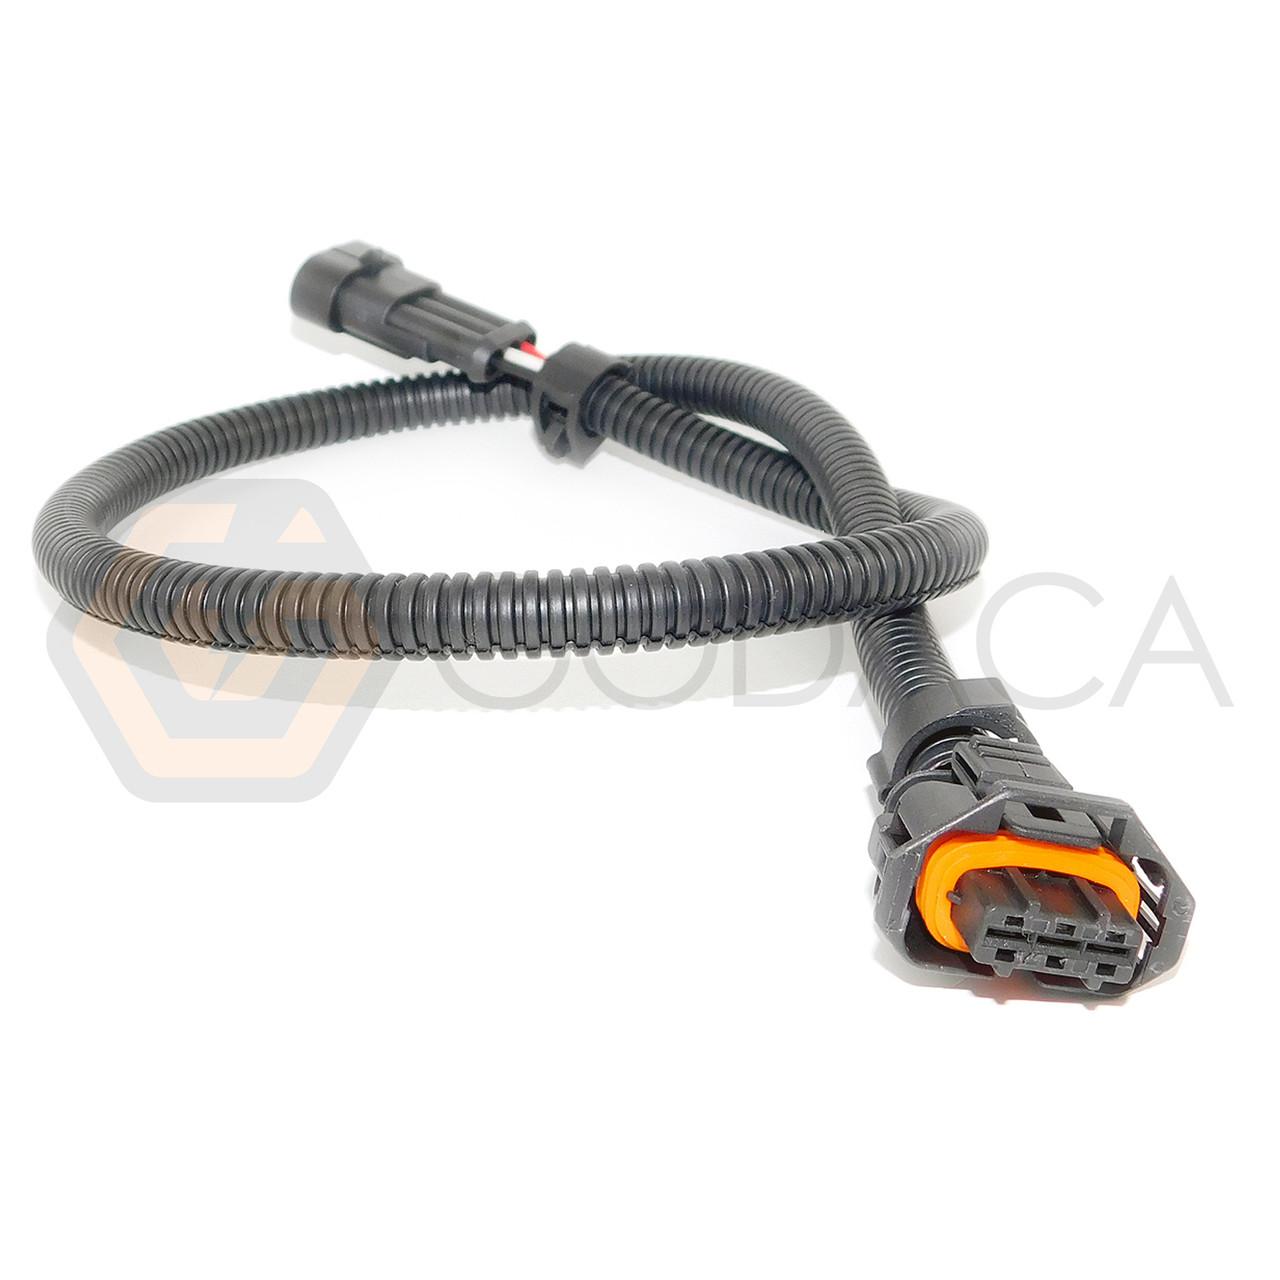 1x wiring harness adapter for ls3 map sensor to ls2 ls1 map 24 godaca llc  [ 1280 x 1280 Pixel ]